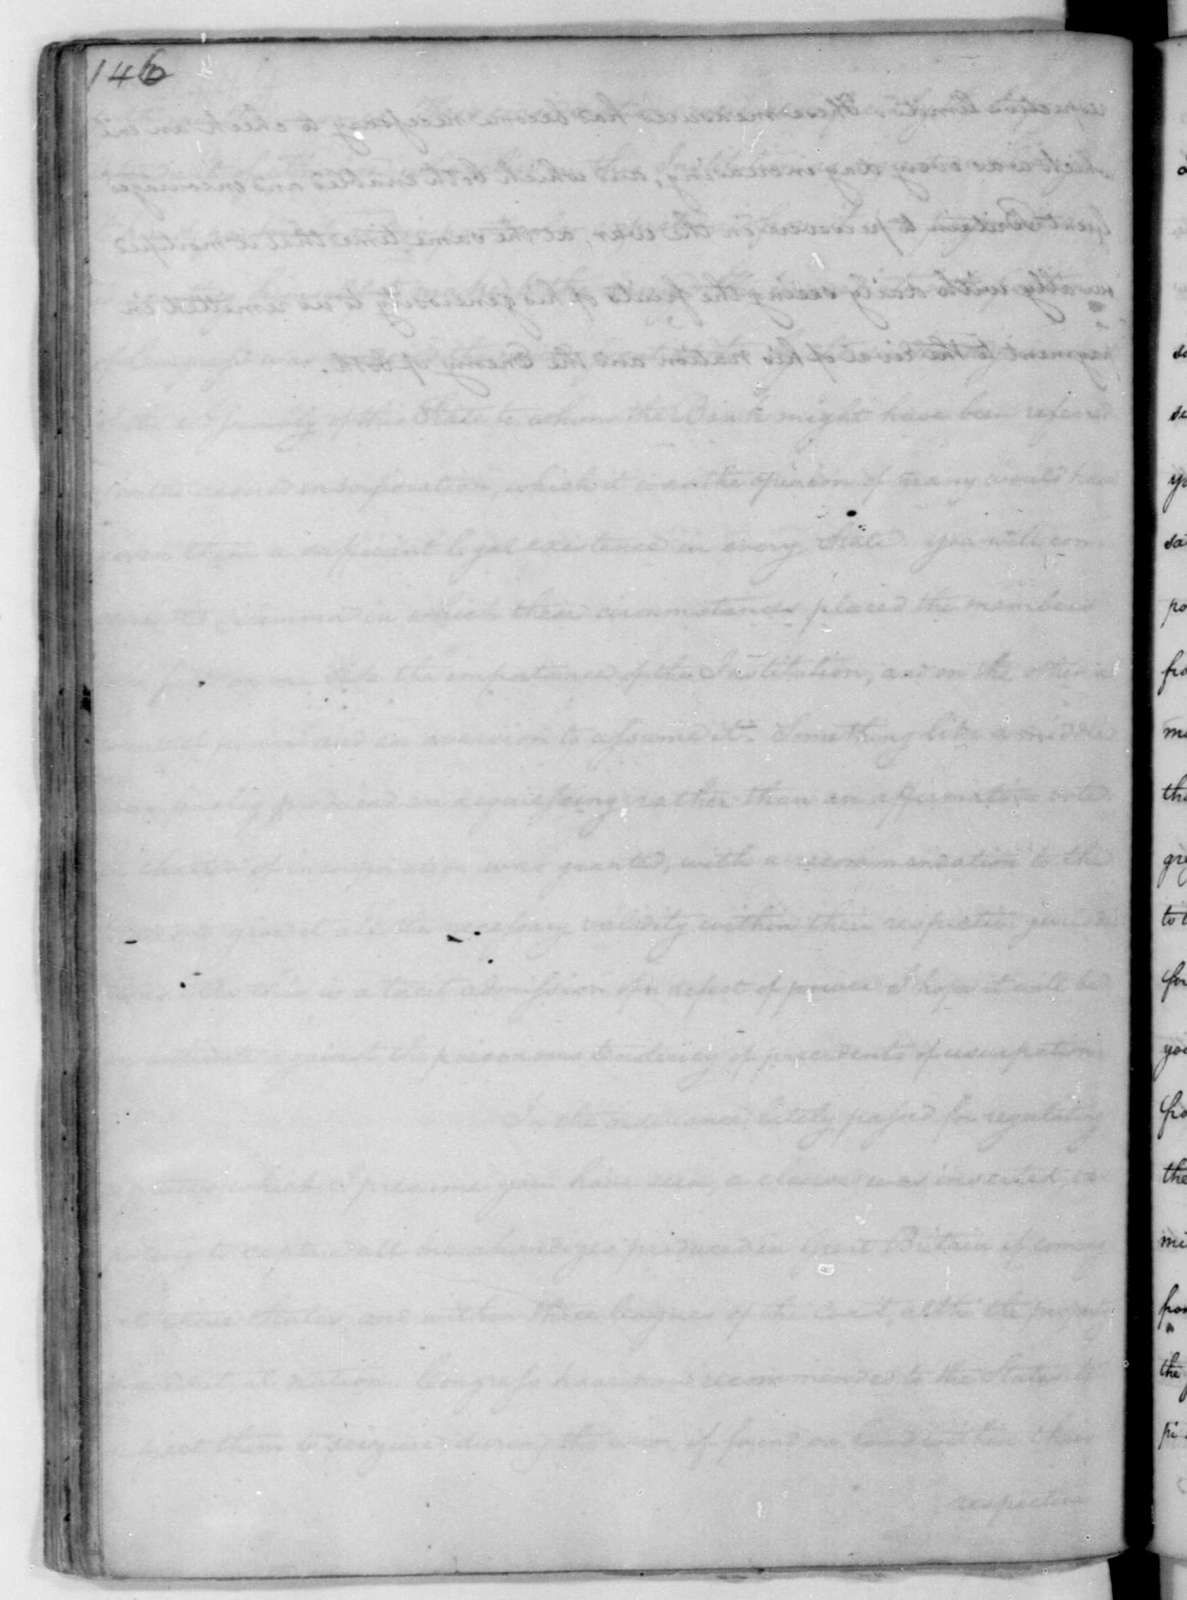 James Madison to Edmund Pendleton, January 8, 1782.